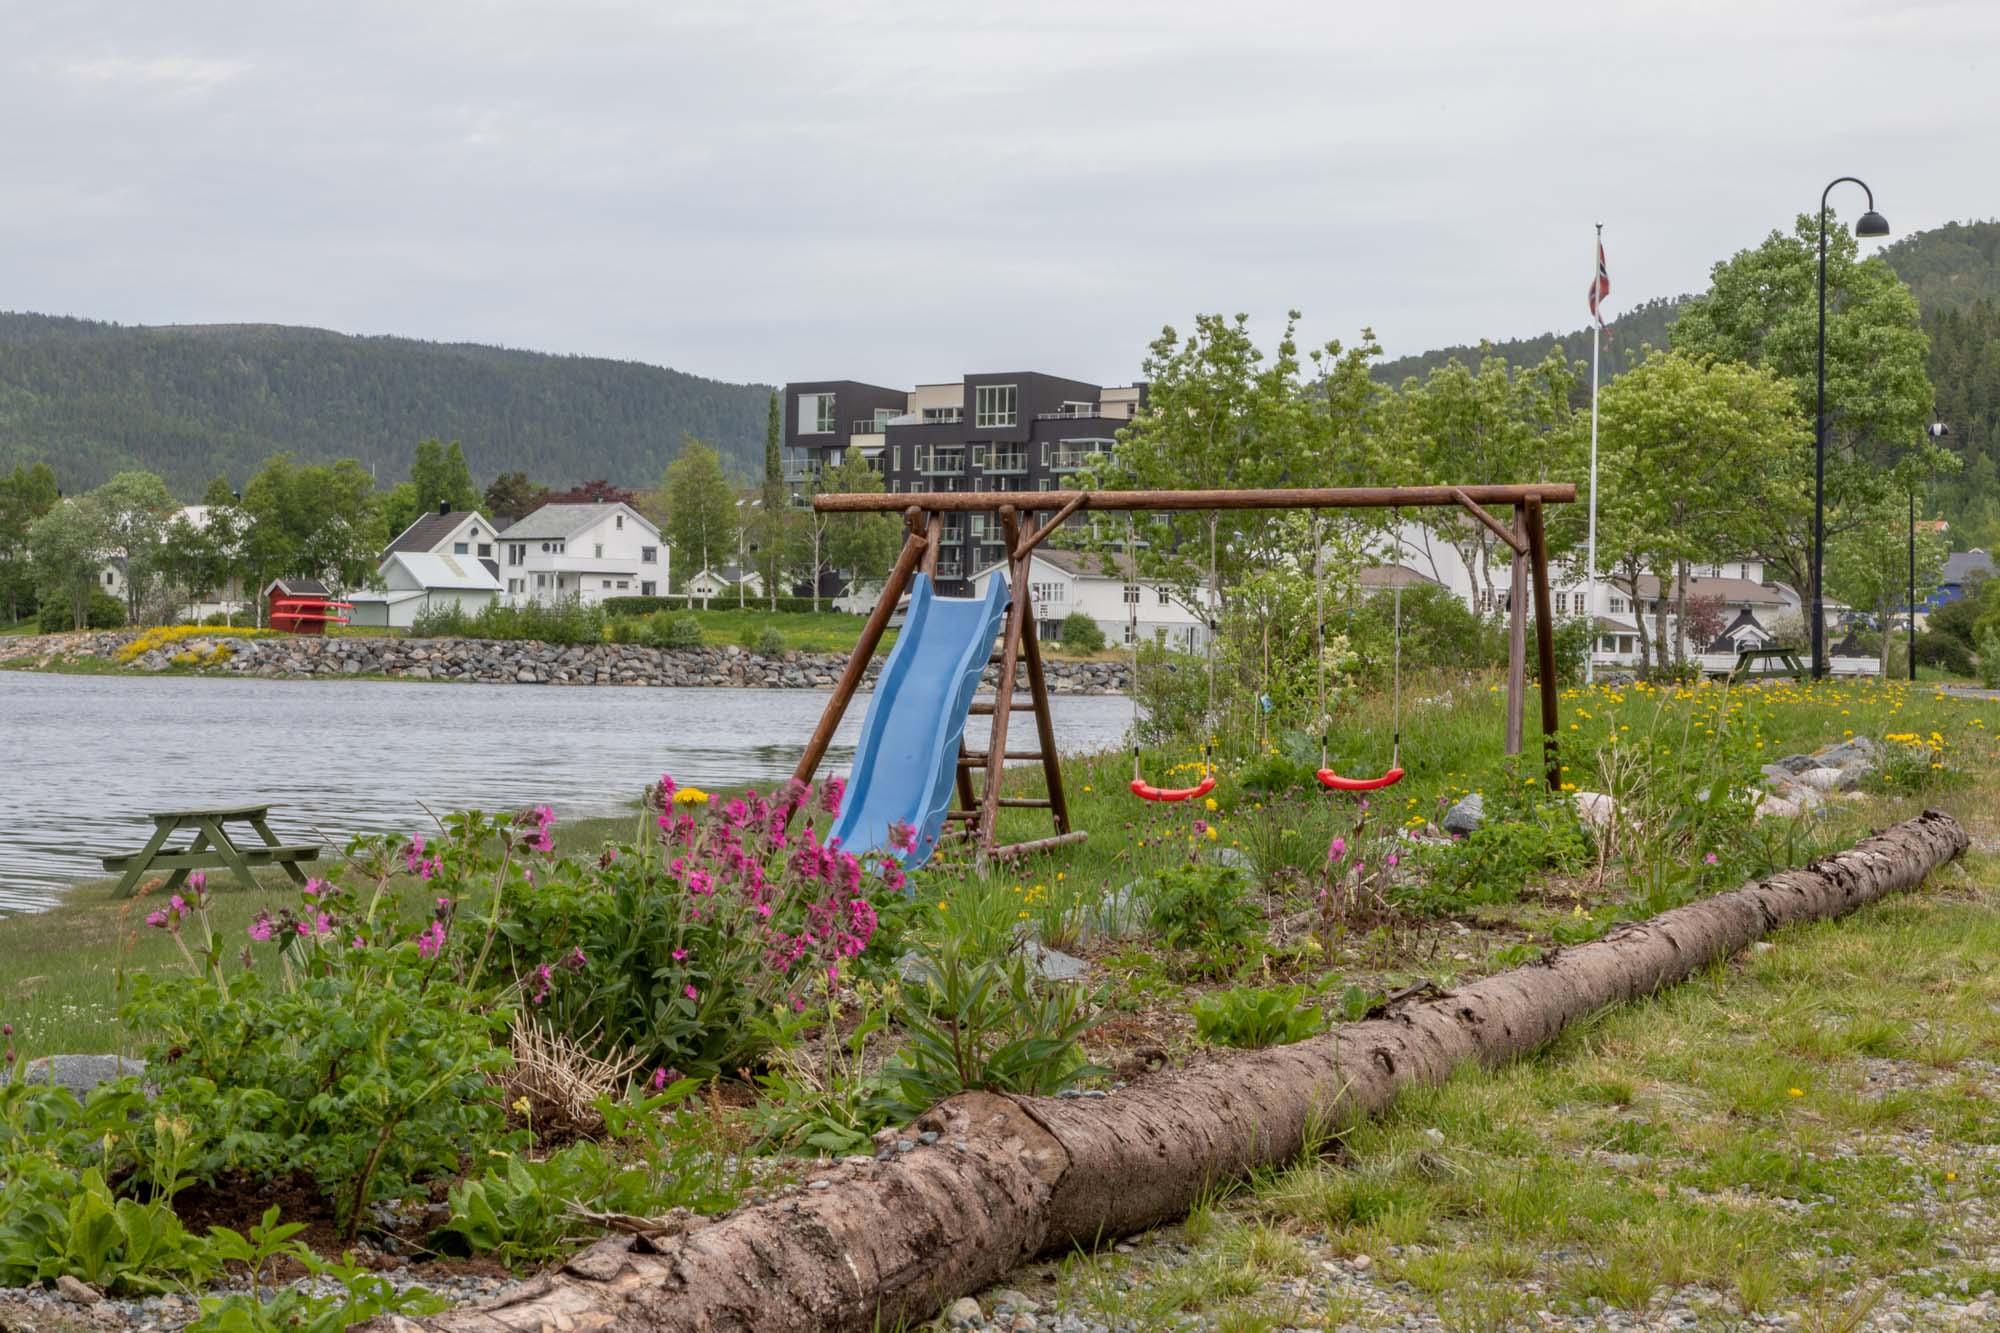 Åfjord Laksecamping 2018